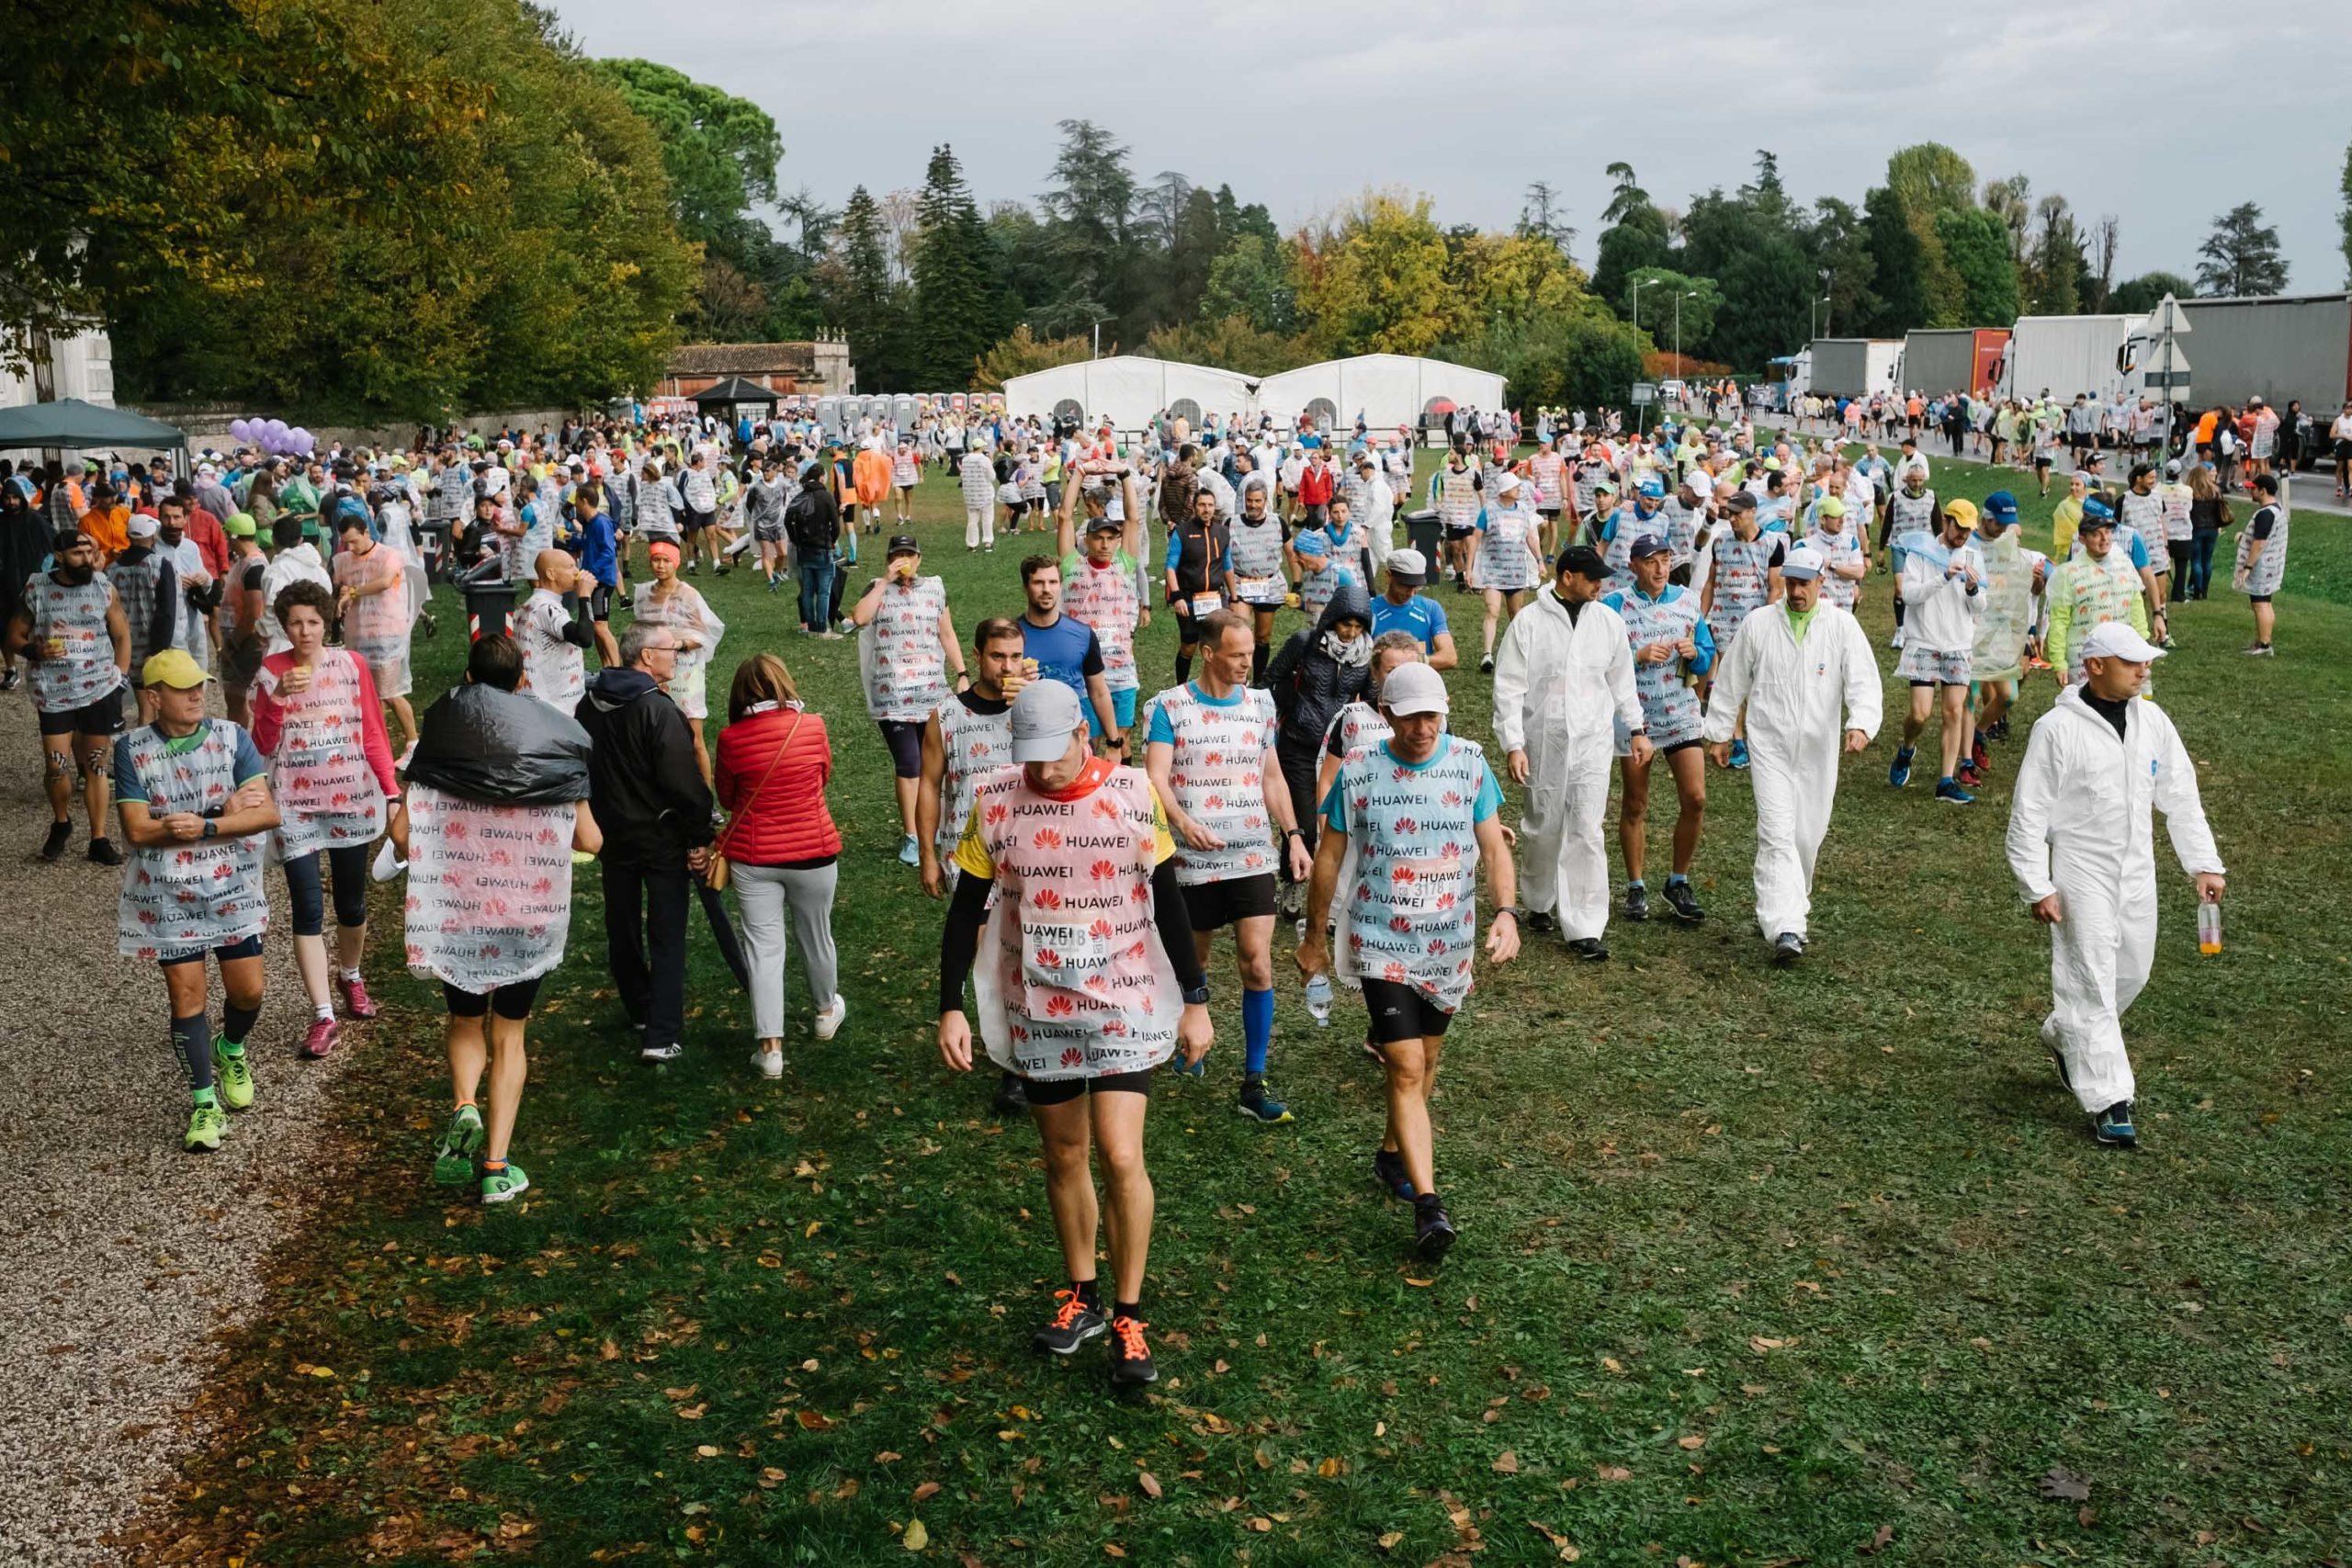 partecipanti alla Huawei marathon